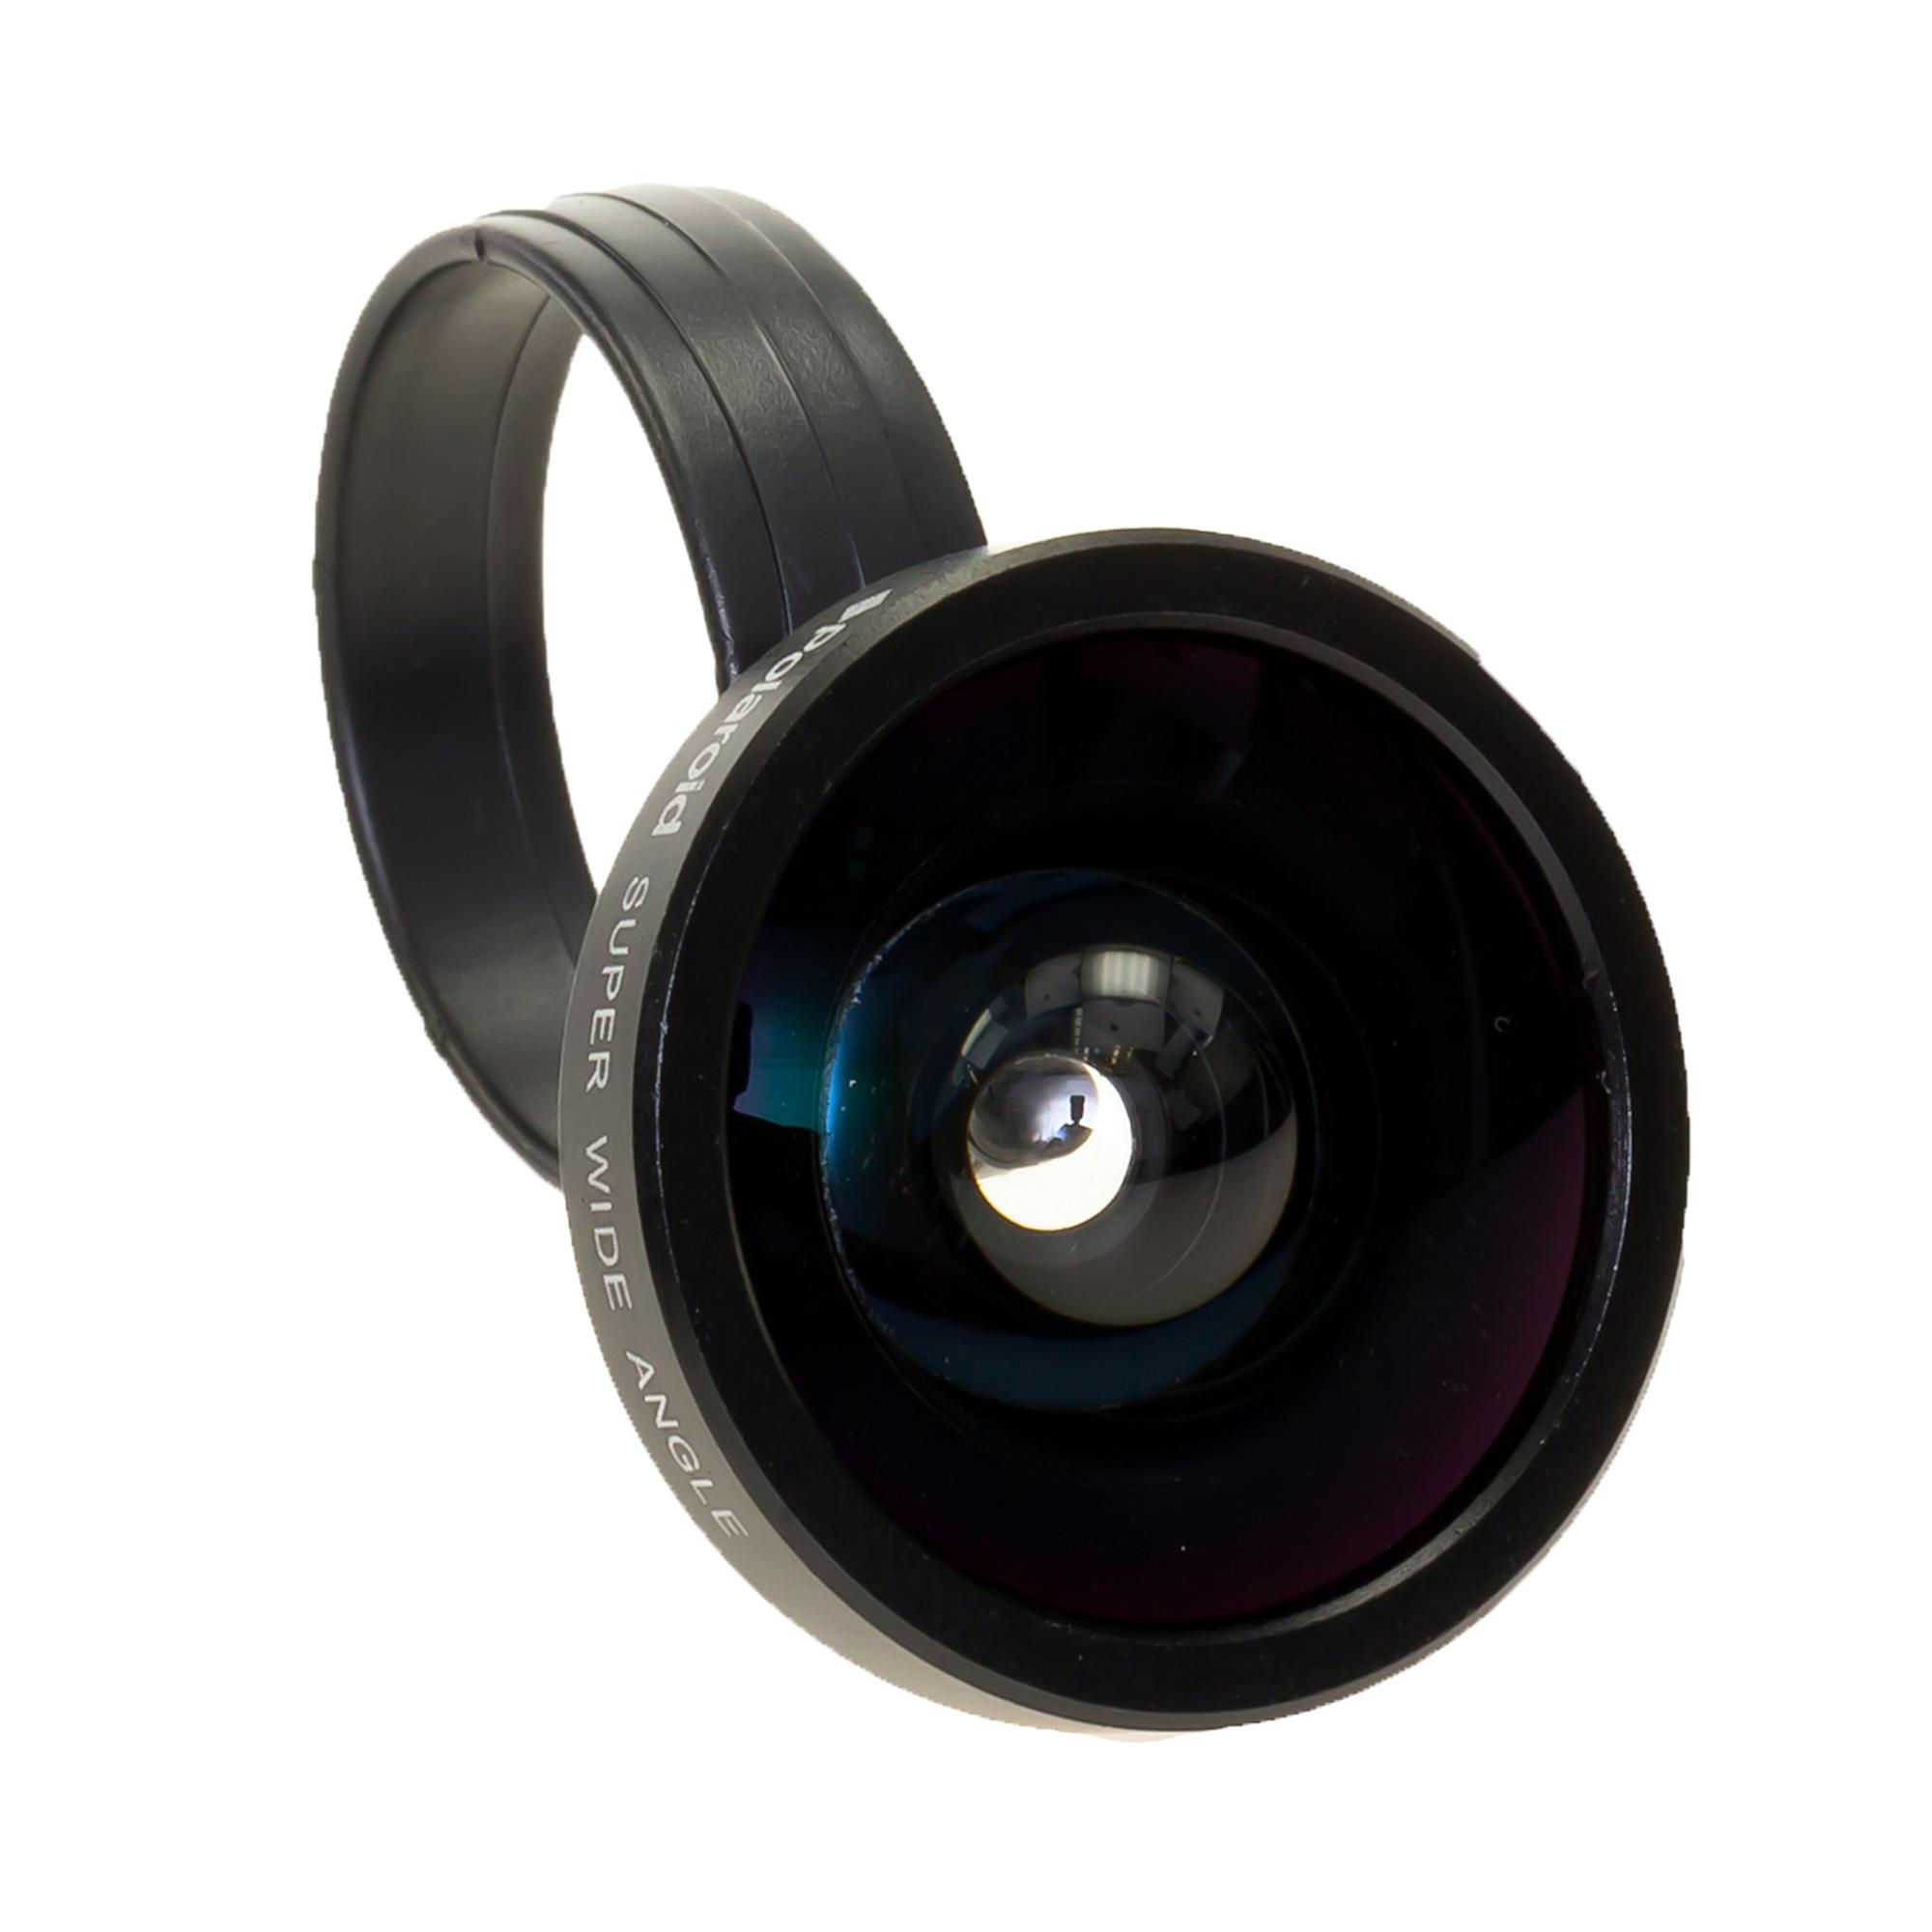 Beli Polaroid Lensa Smartphone 4X Super Wide Angle Lens Hitam Polaroid Asli